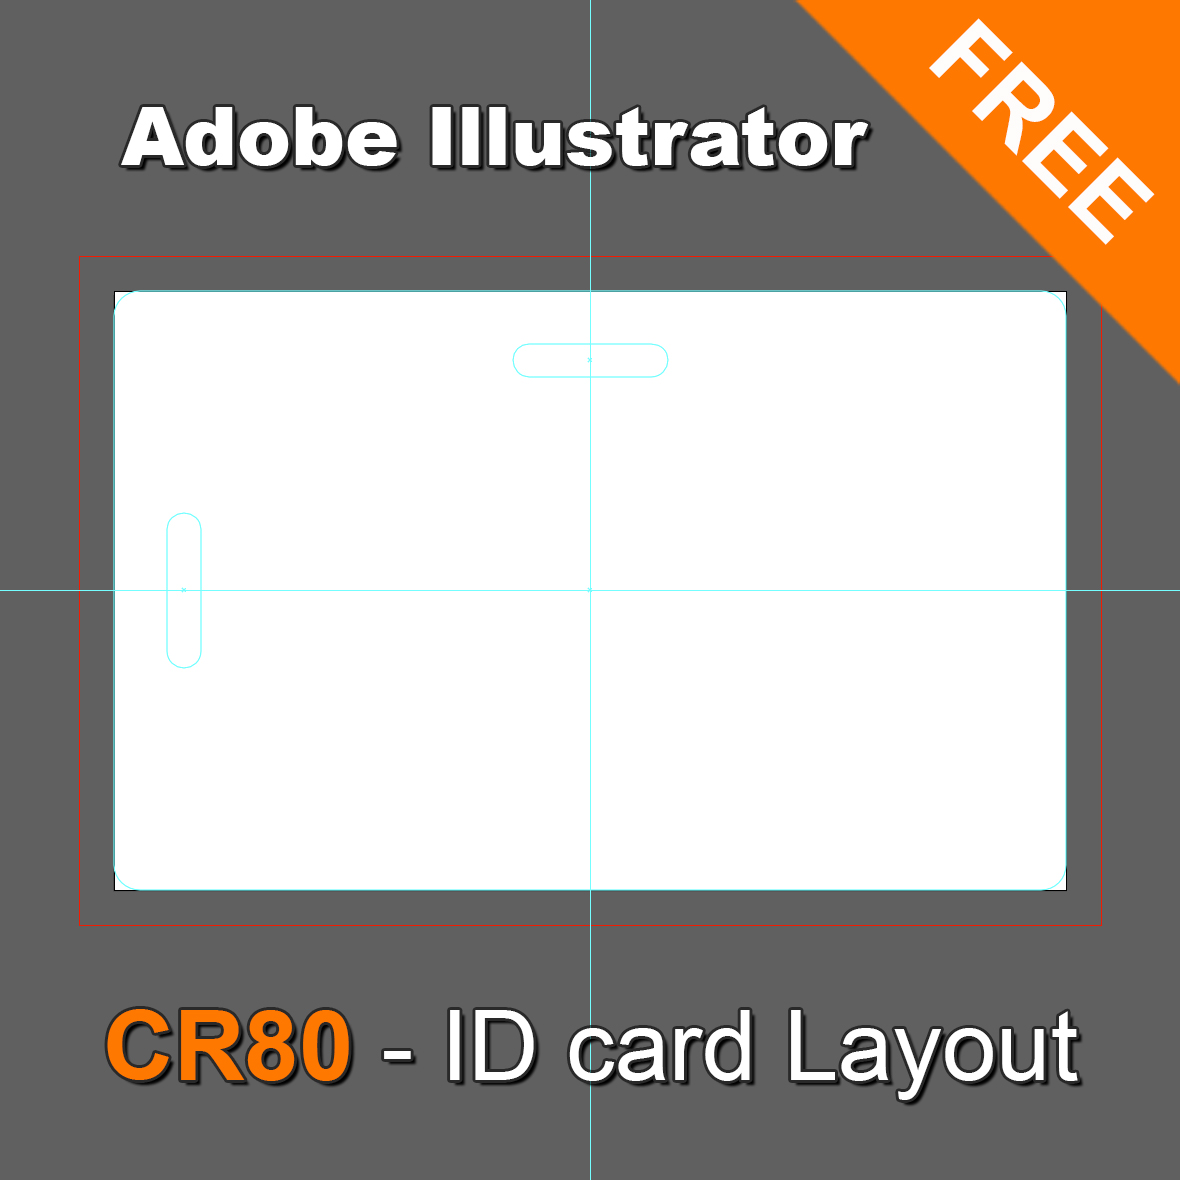 ID Card Dimensions, ID Card Sizes, ID Card Dimension information, CR80 Illustrator Layout